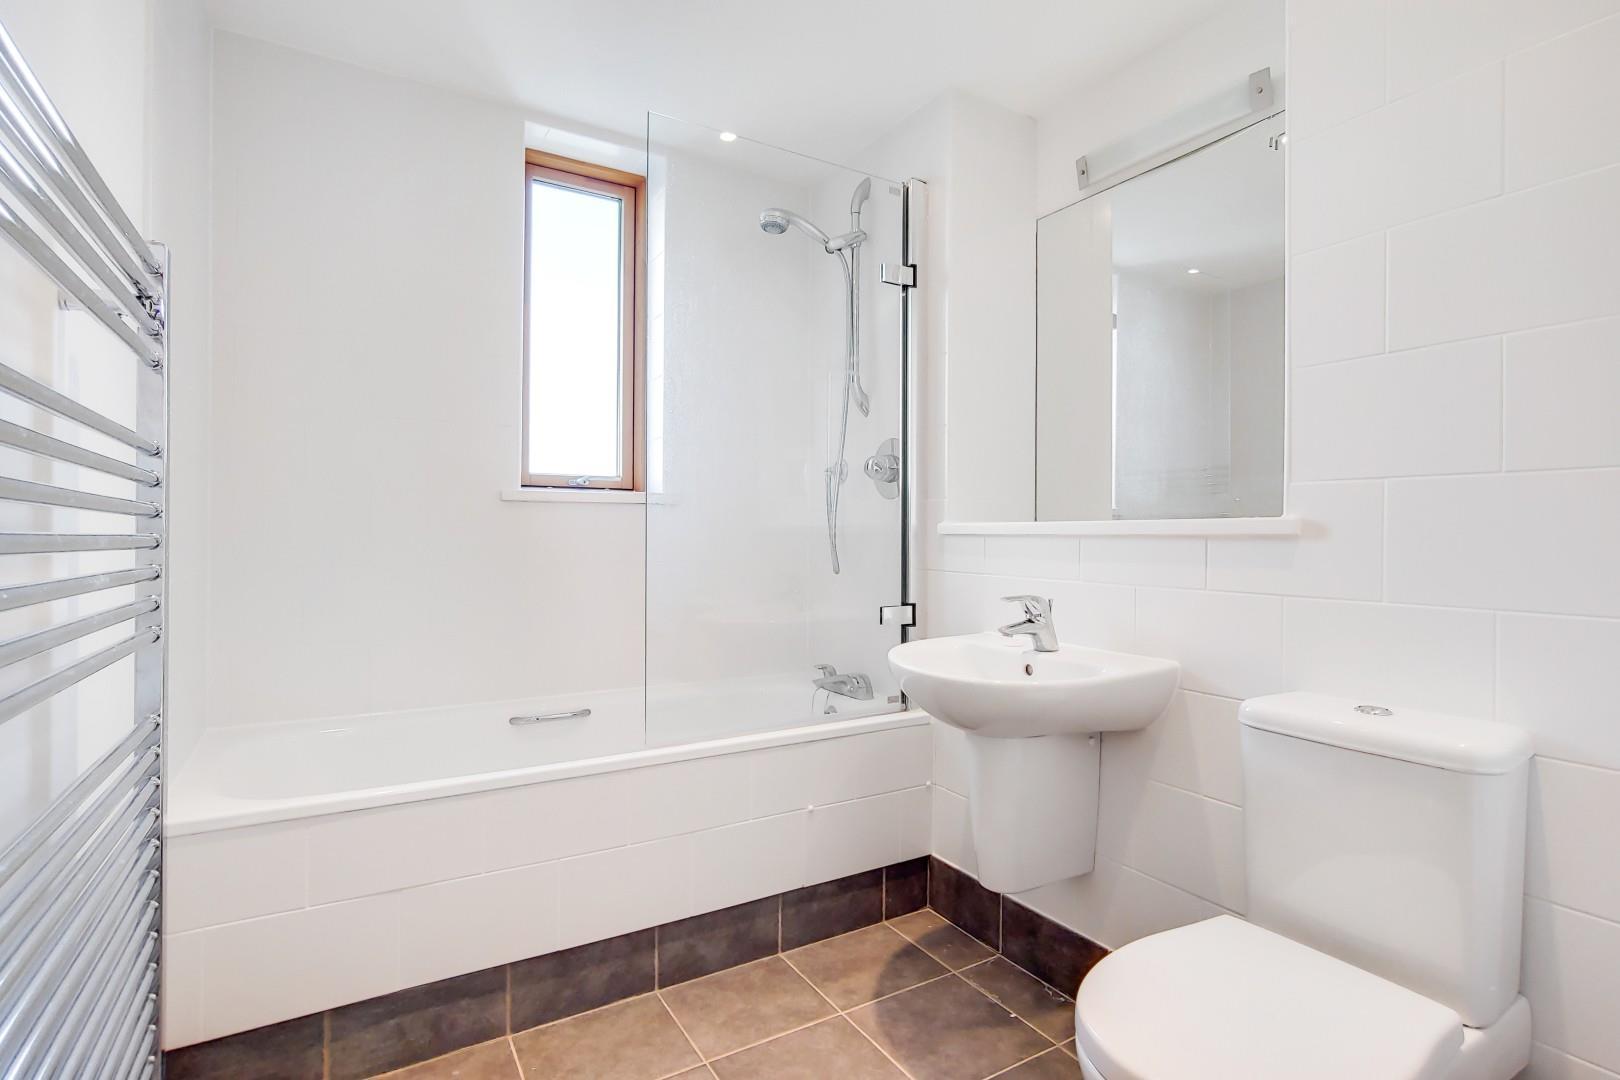 10_Bathroom-0.jpg